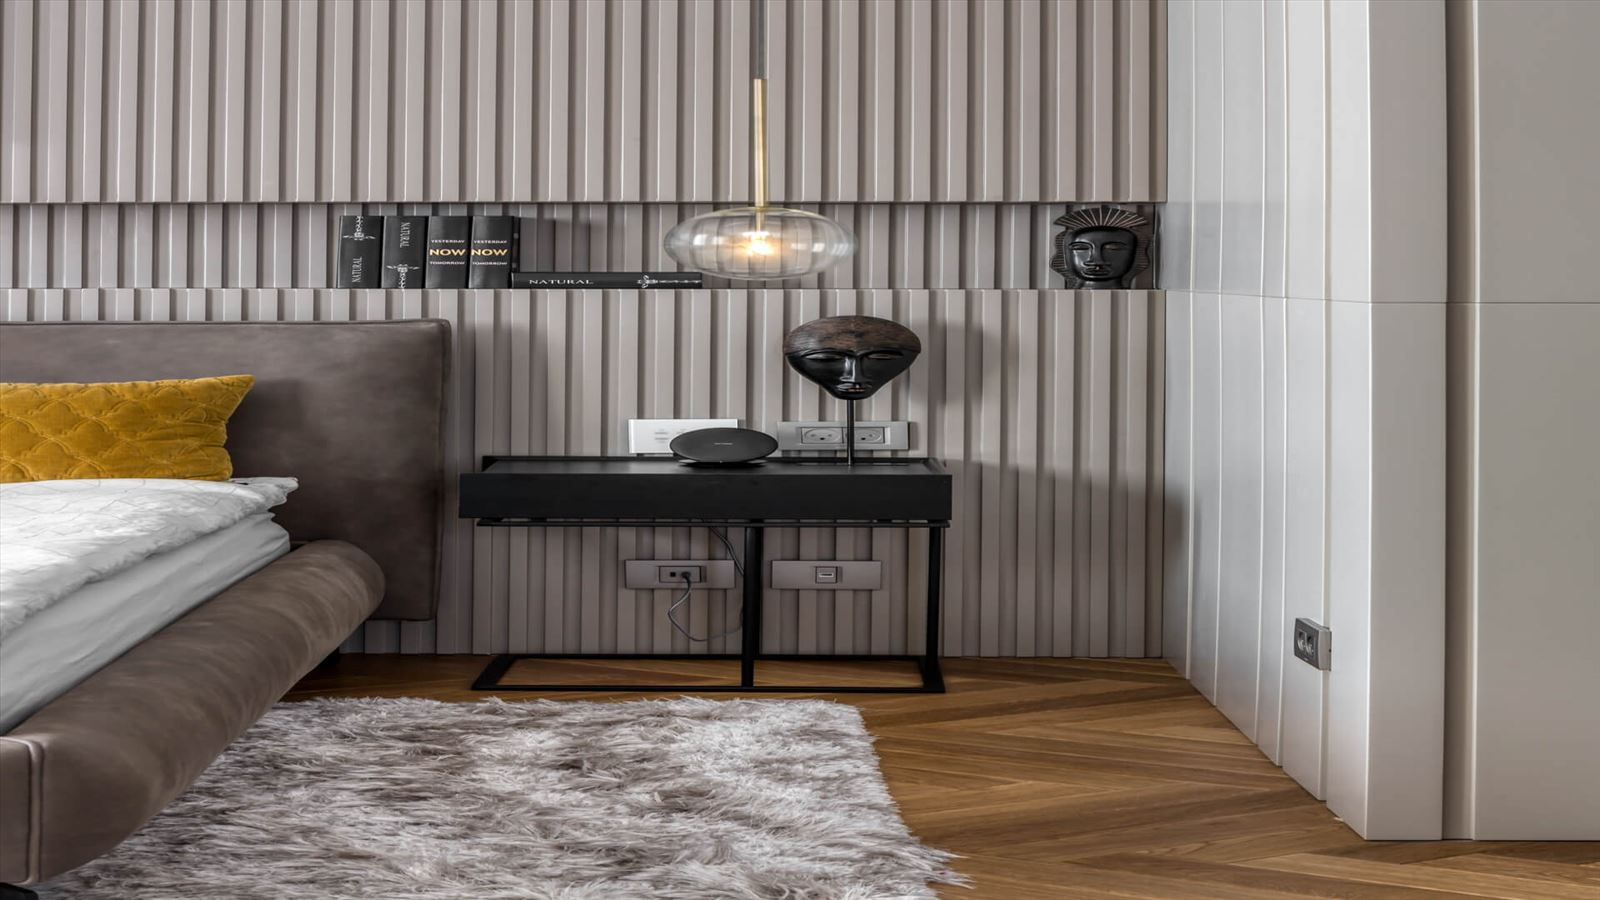 Penthouse Carmelit - תאורה אדריכלית בחדר השינה על ידי קמחי תאורה